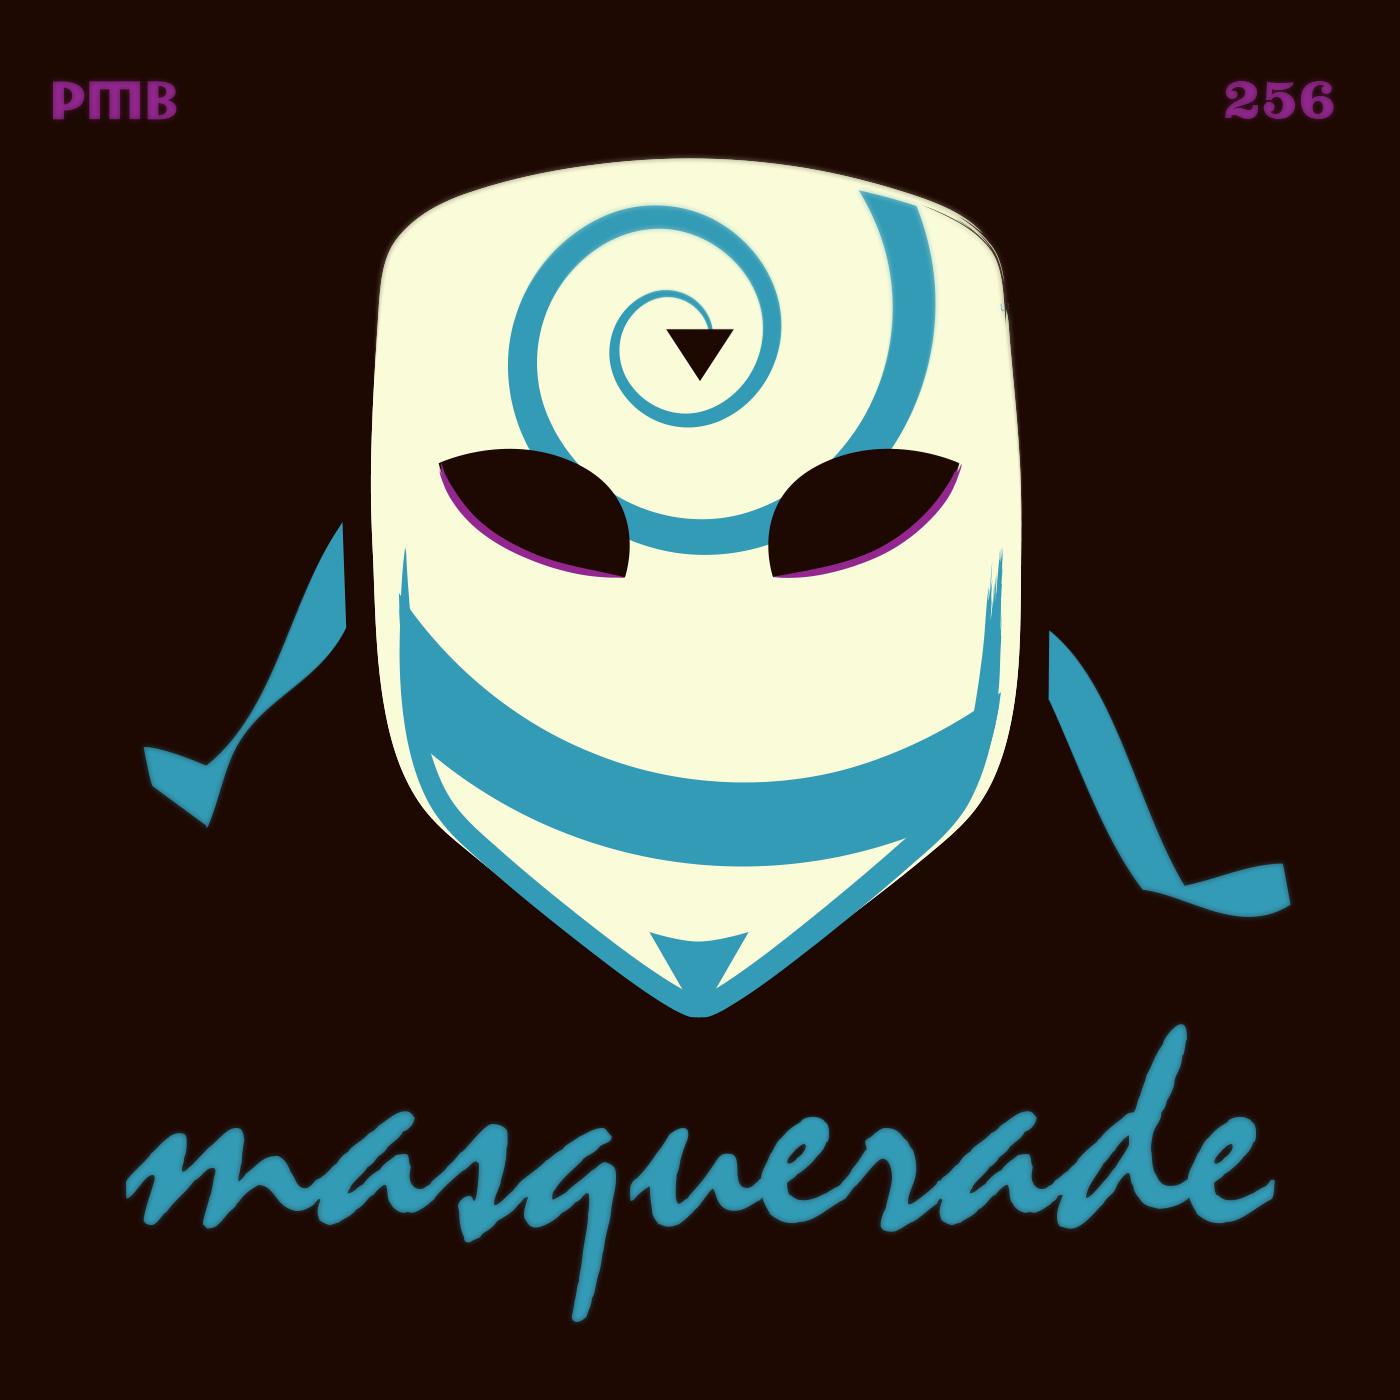 PMB256 Masquerade